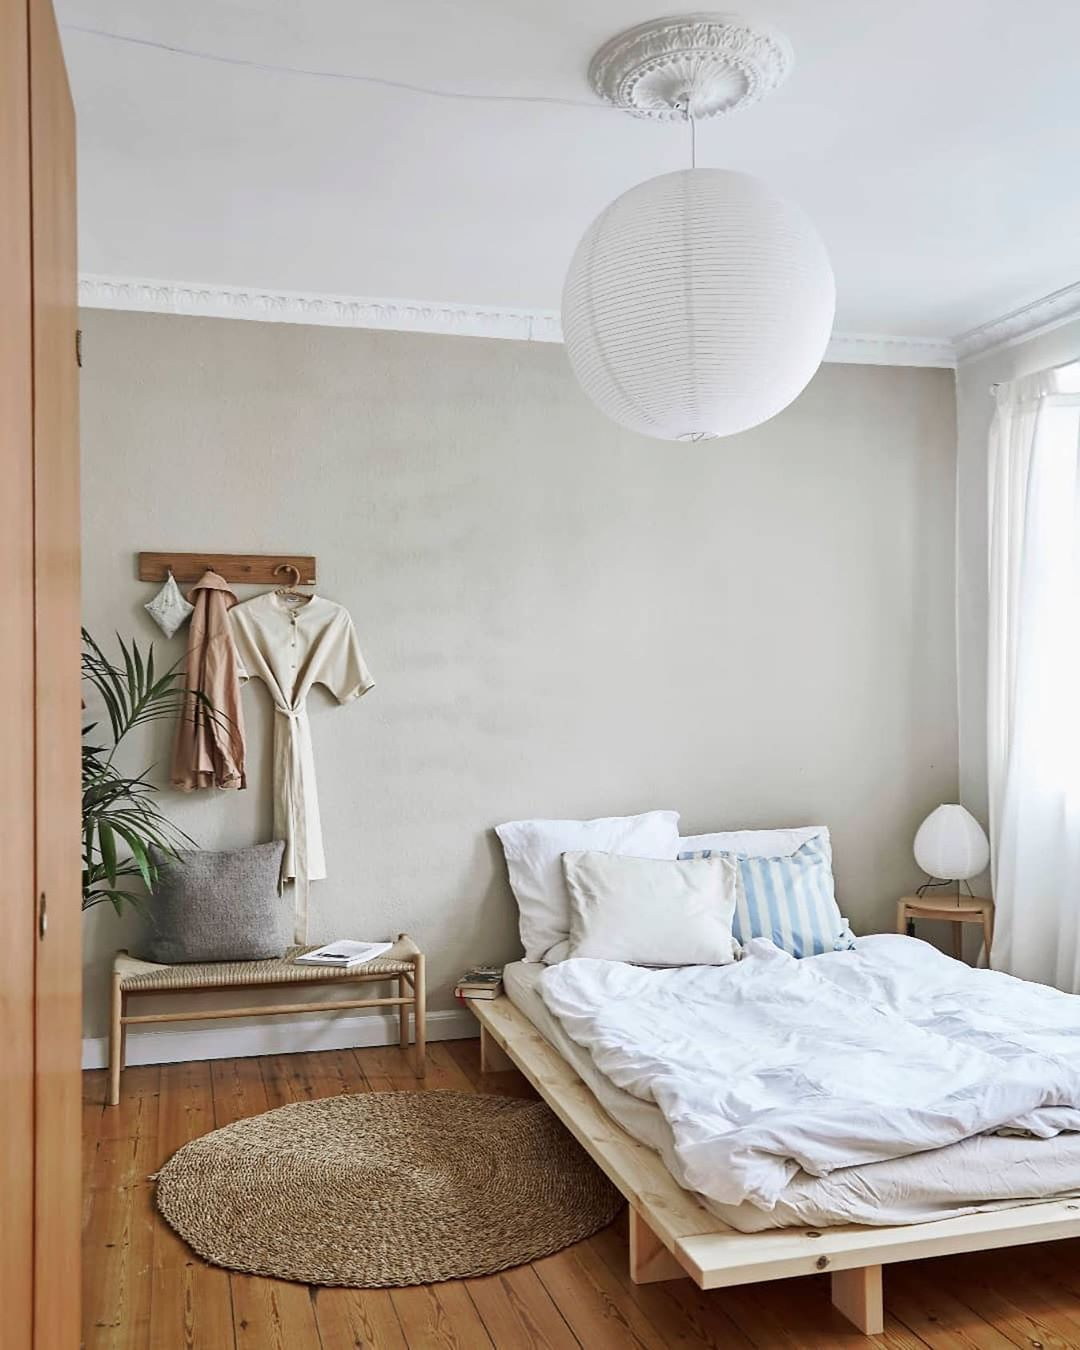 Karup Design On Instagram Your Japanese Room Where The Weekends Should Be Spent Japanese Inspired Bedroom Scandinavian Interior Bedroom Bedroom Interior